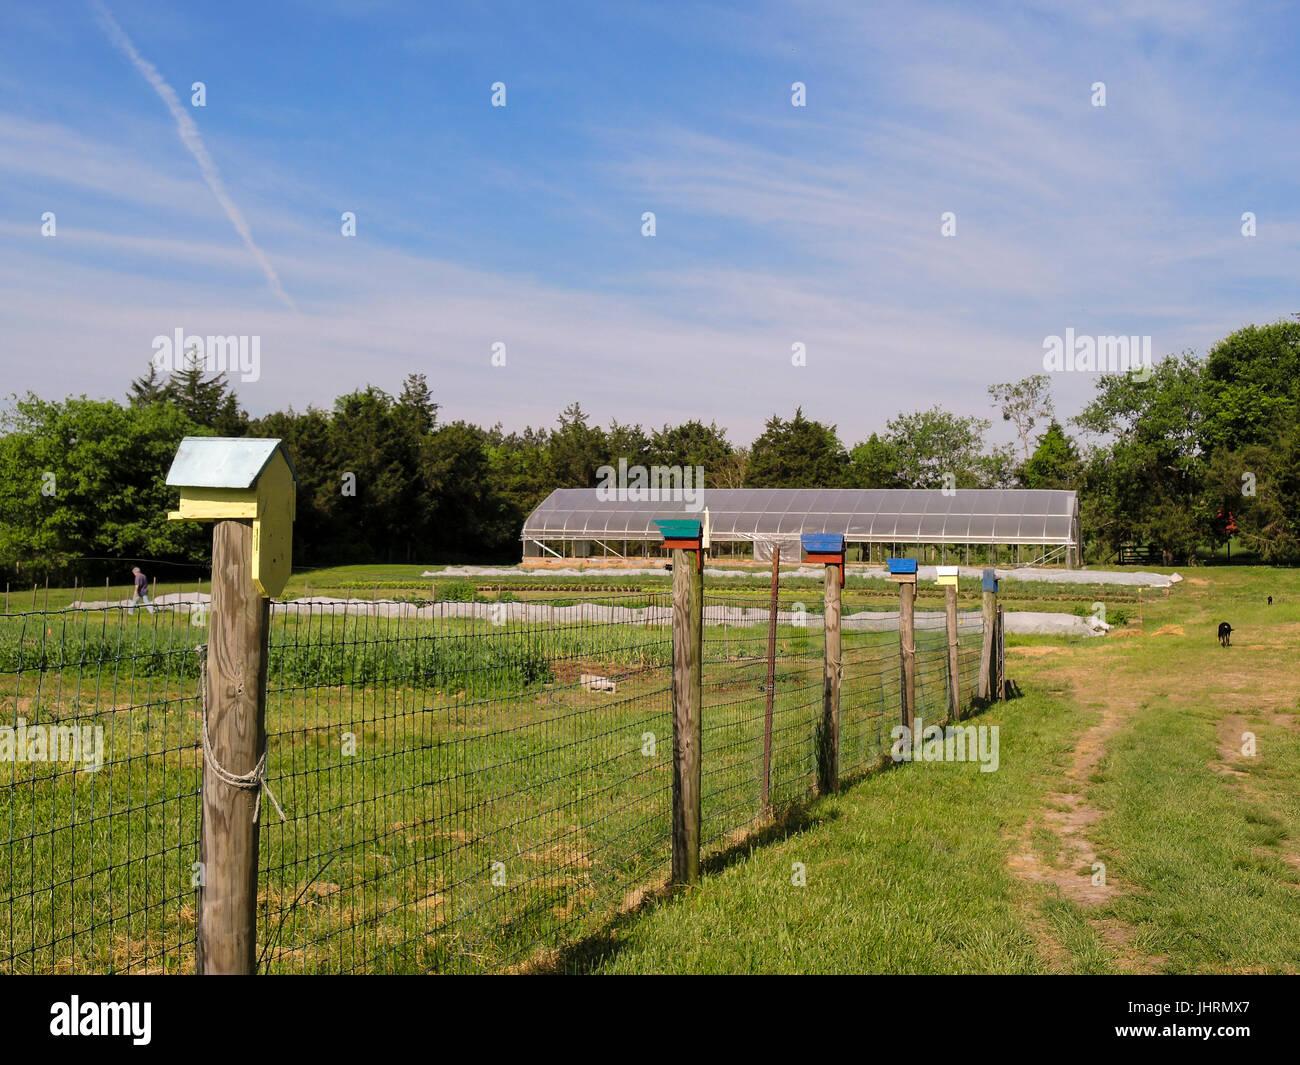 Bird houses on fence post, farm - Stock Image